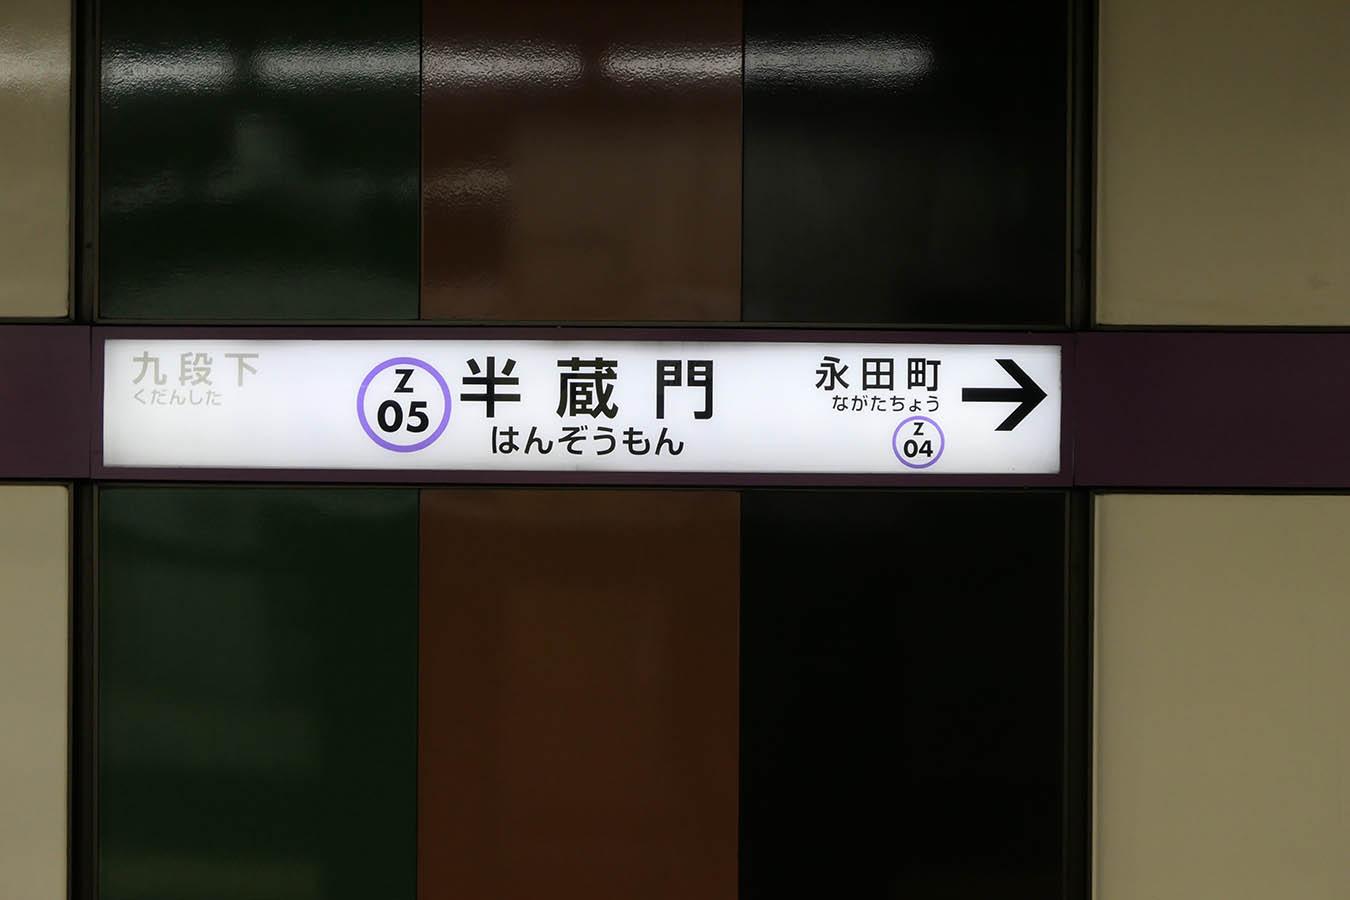 z05_photo03.jpg